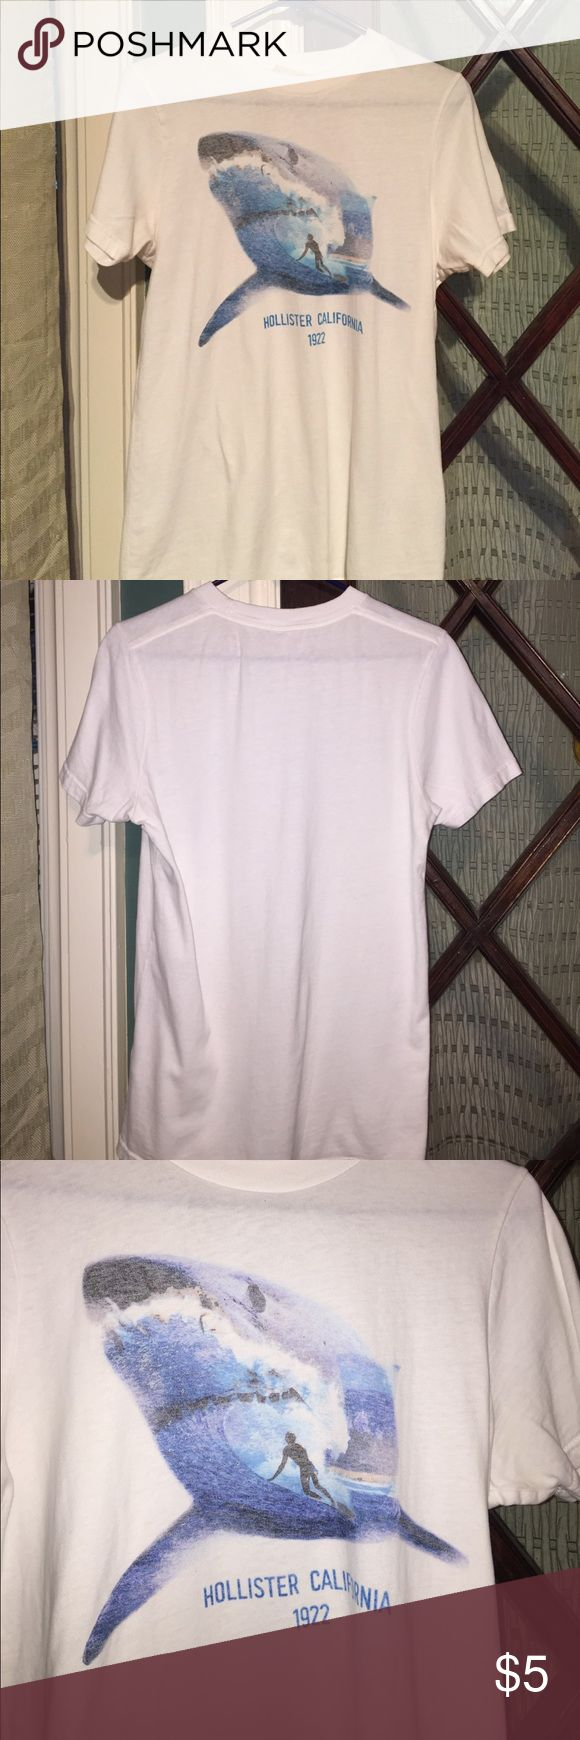 White Hollister Tshirt White Hollister Tshirt Hollister Shirts Tees - Short Sleeve